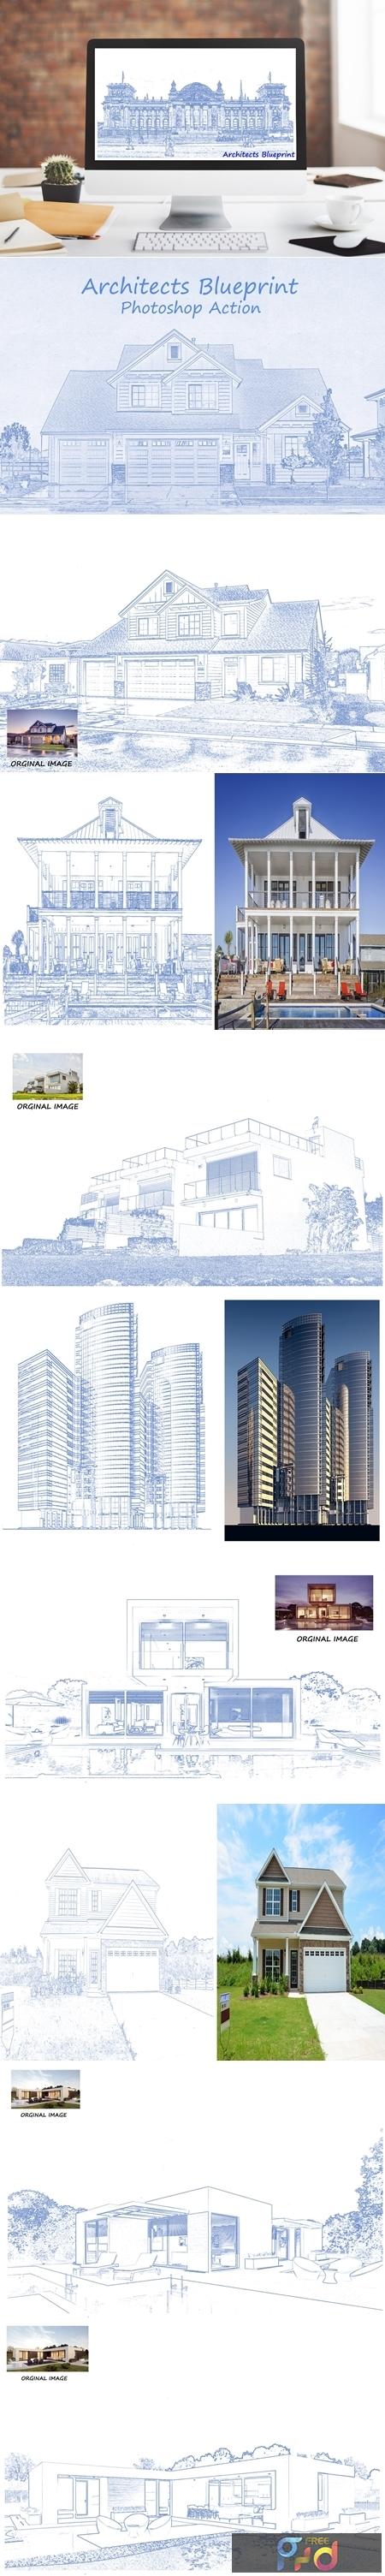 Architects Blueprint - PS Action 4113879 1